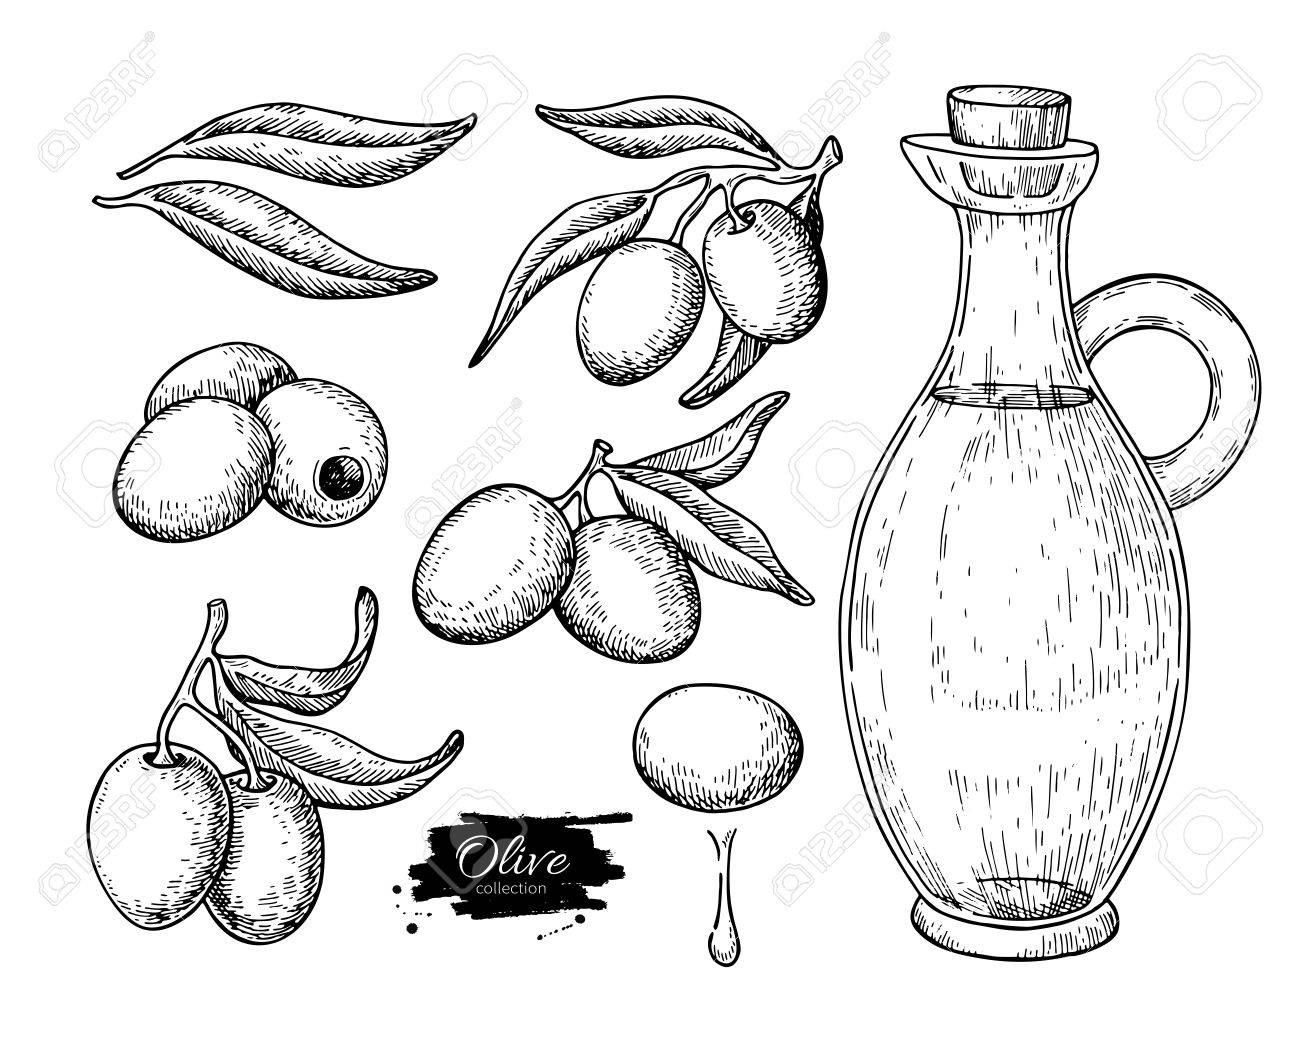 Coloriage Arbre Dolive.Bouteille D Huile D Olive Et Branche D Olivier Vector Illustration